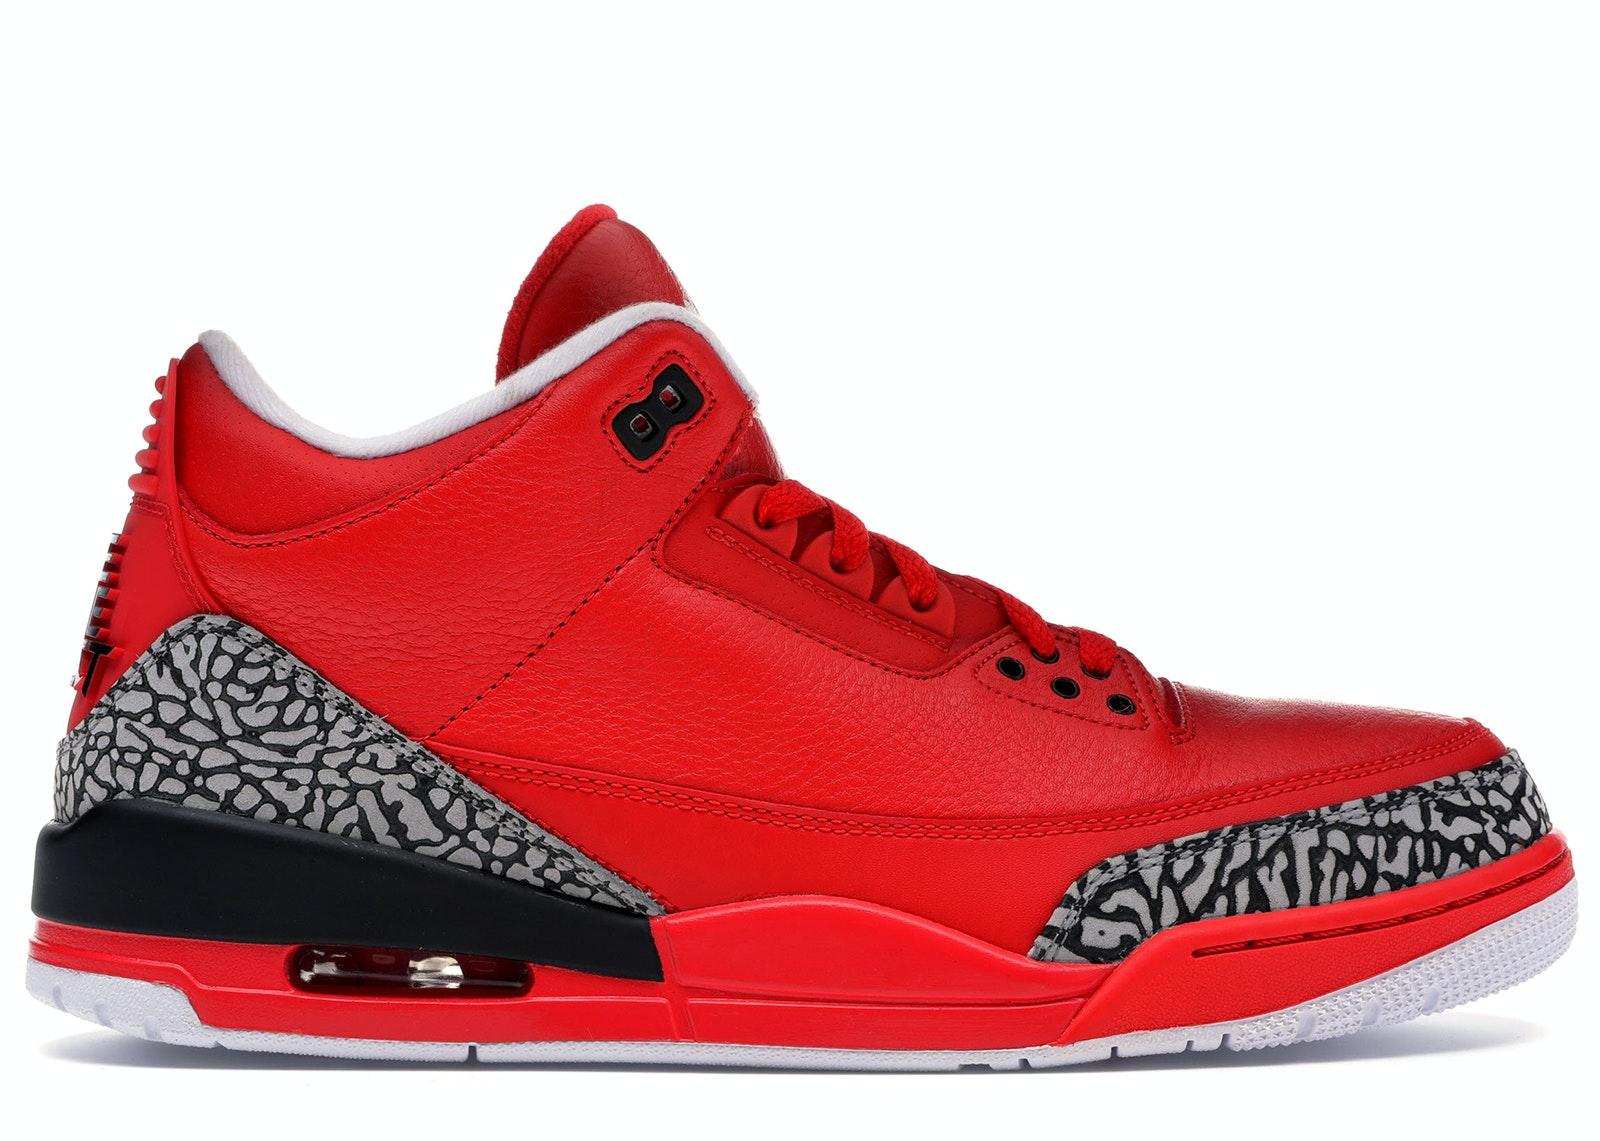 jordan shoes retro 3